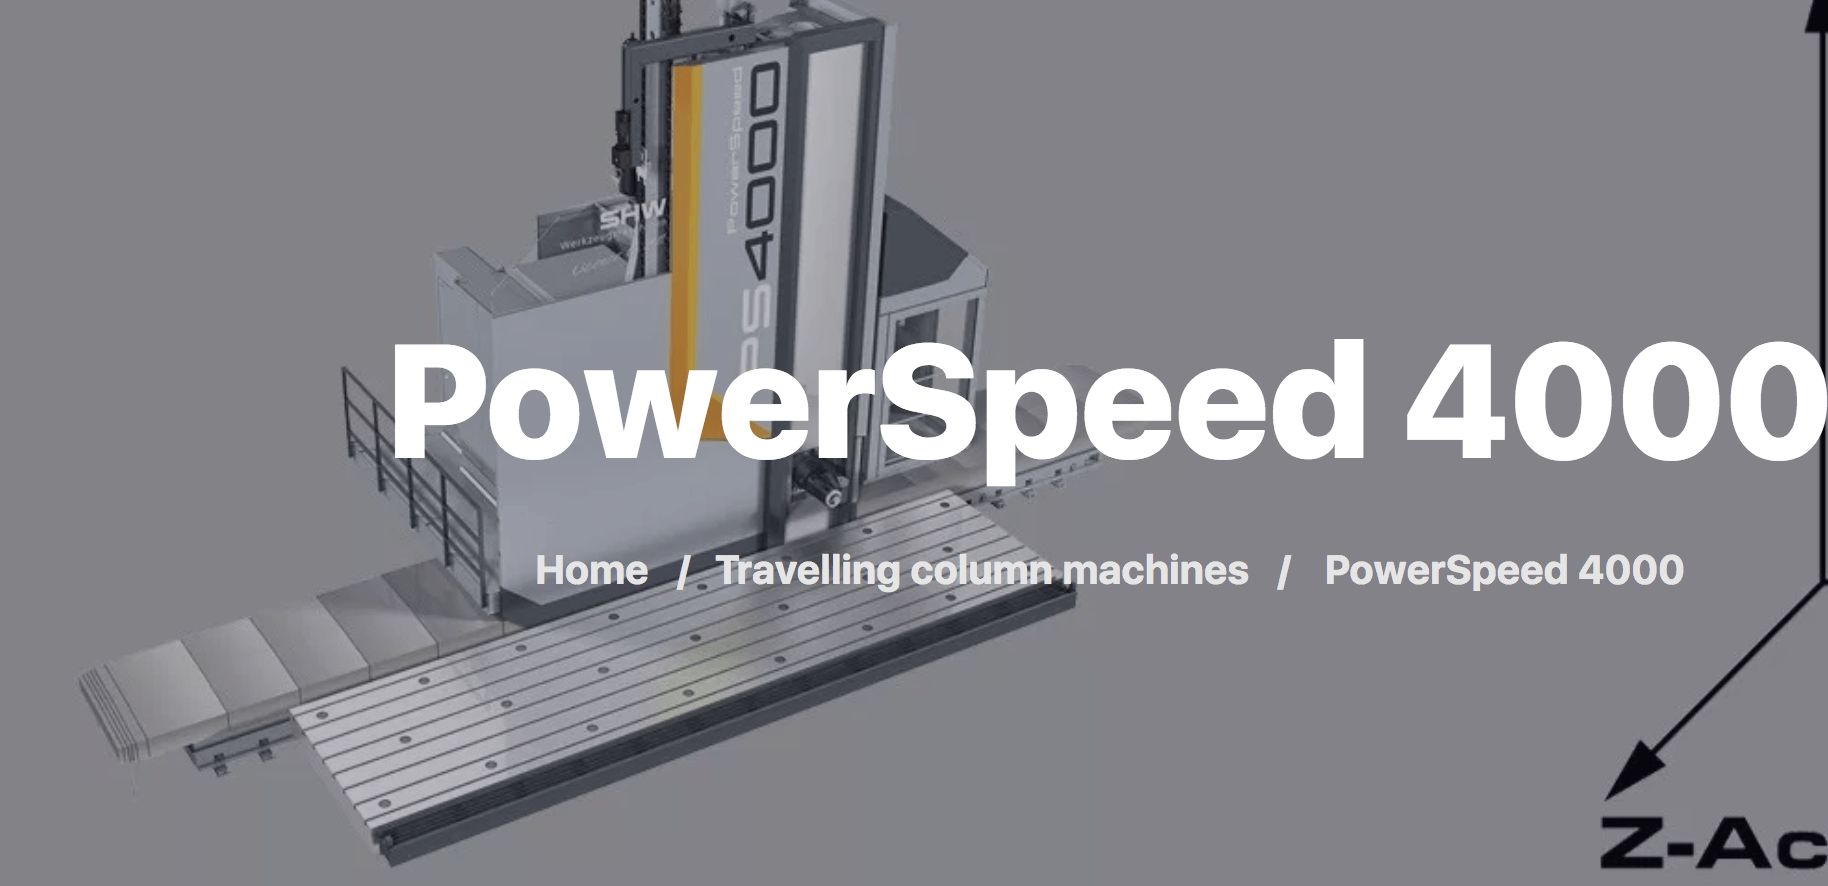 Powerspeed 4000 travelling column machine